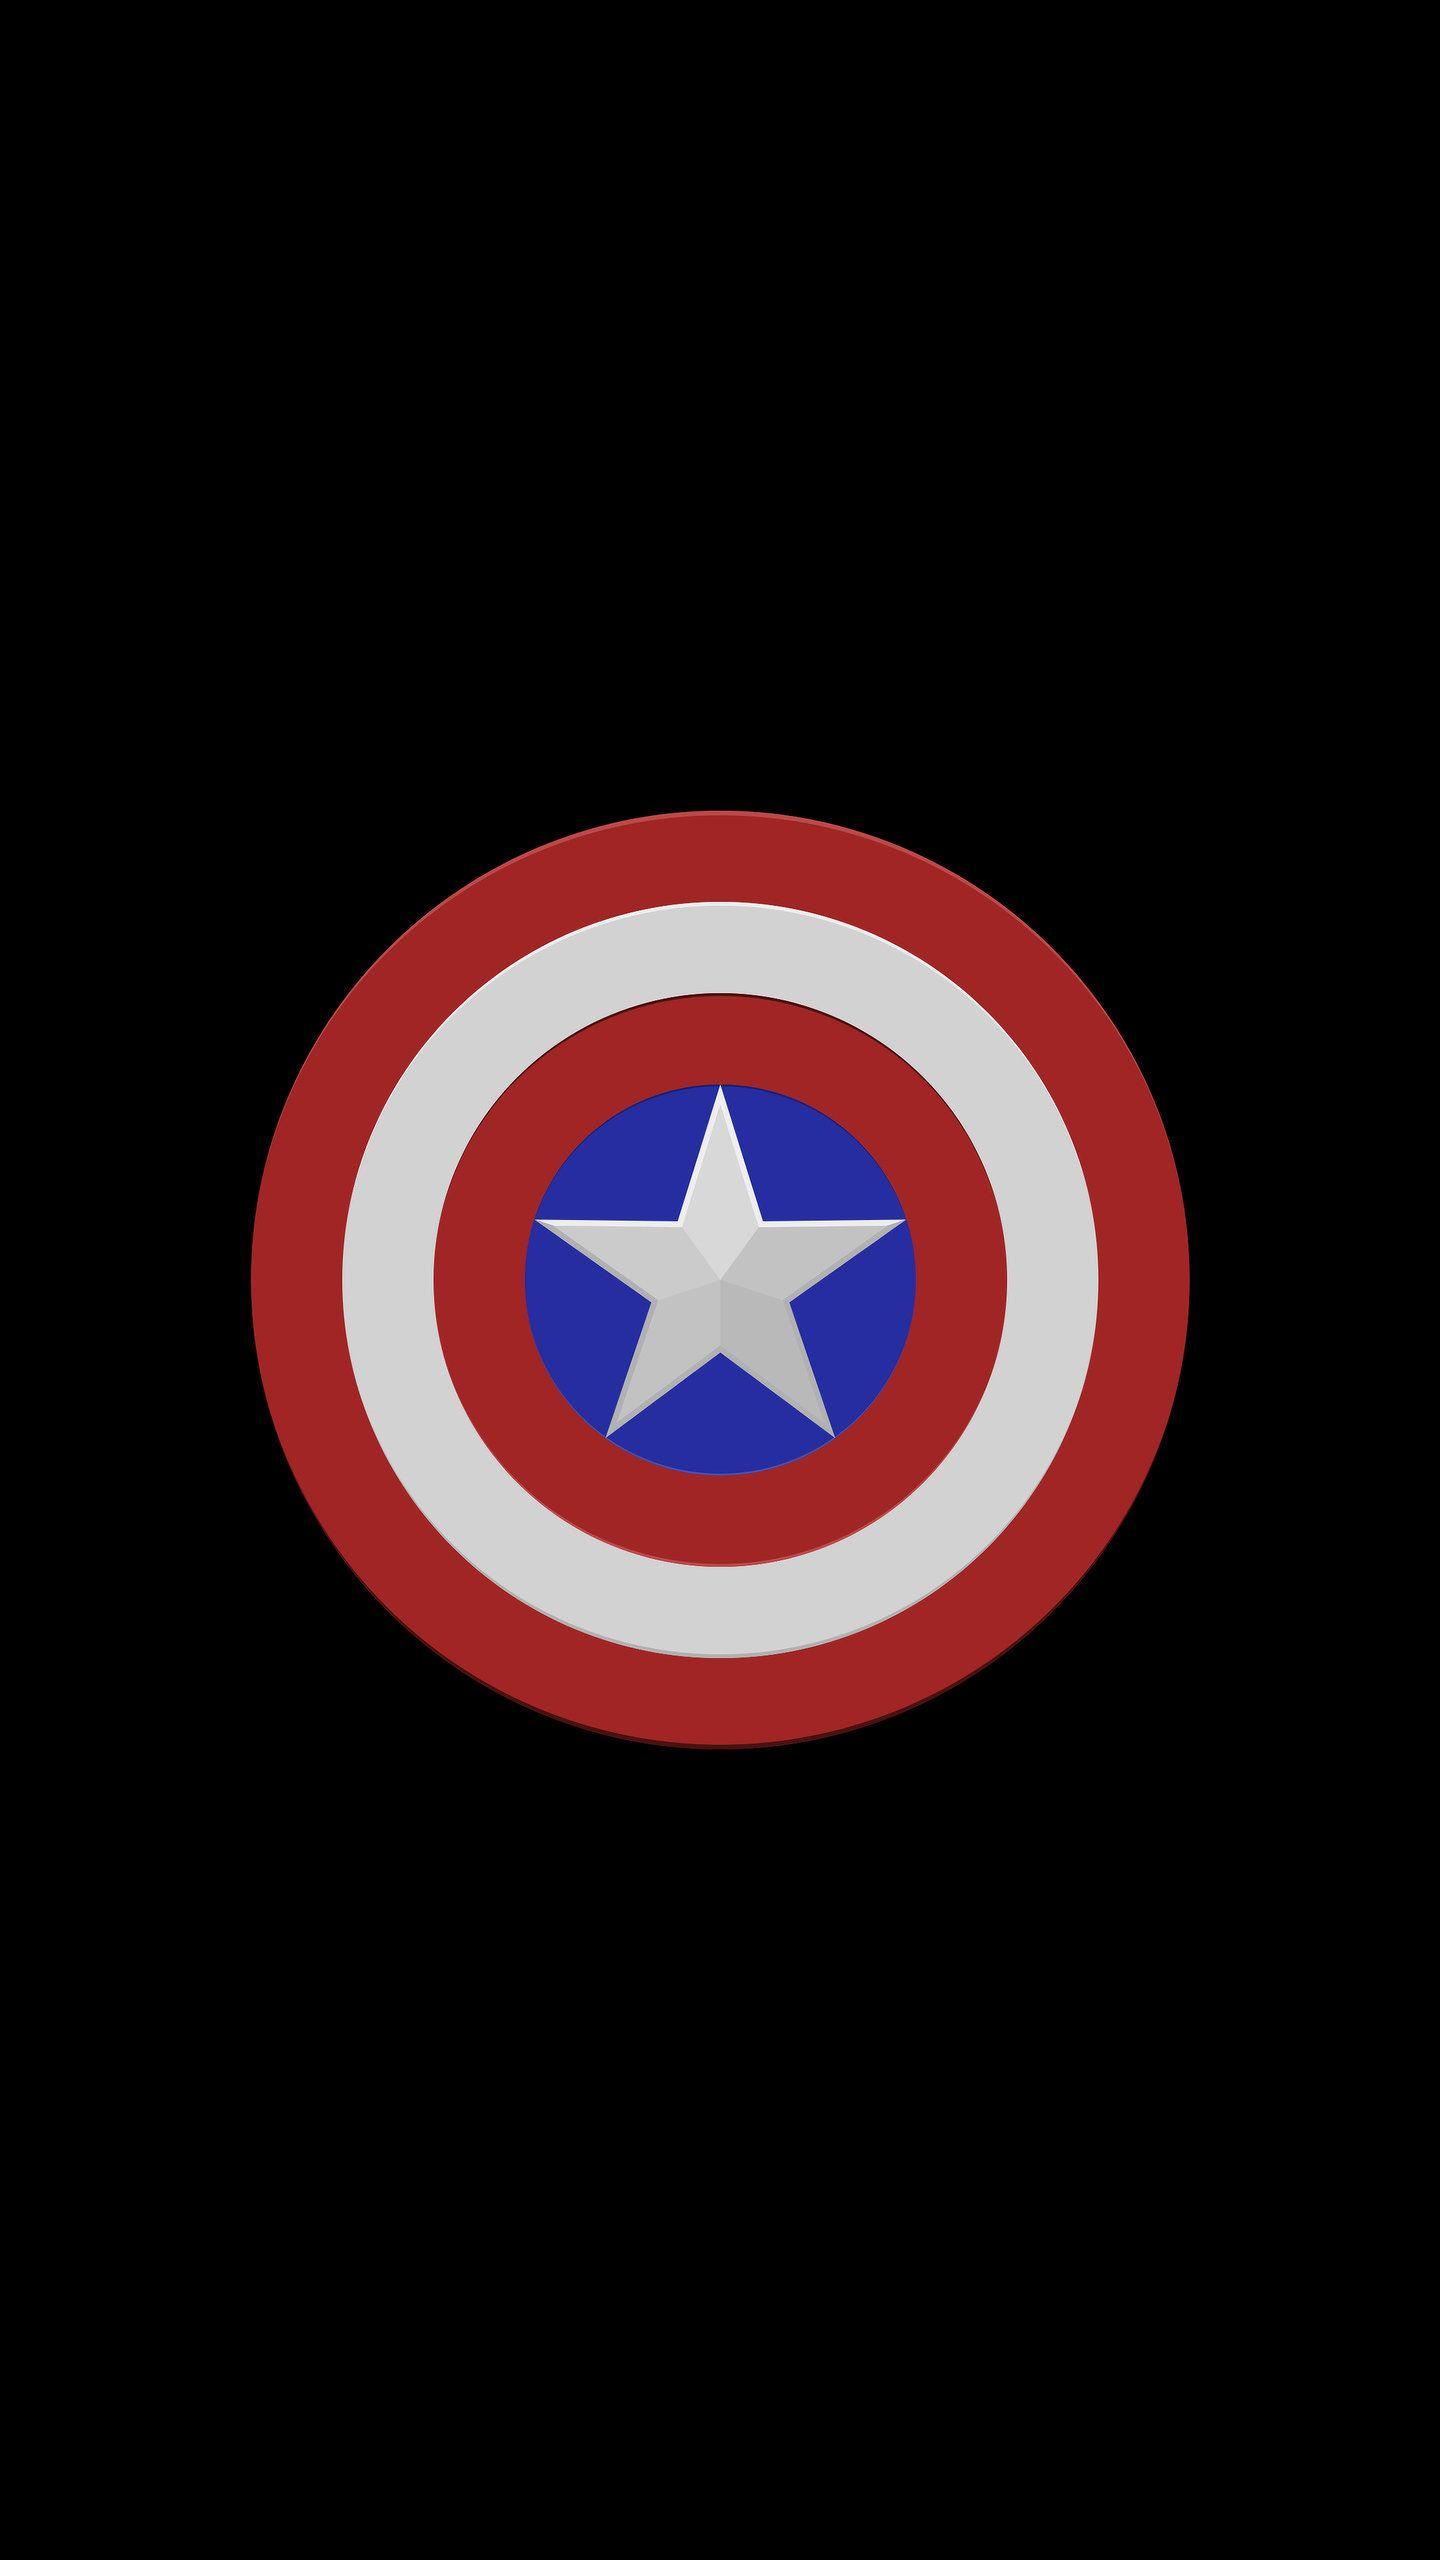 1440x2560 Wallpaper Dark Mywallpapers Site Captain America Shield Wallpaper Captain America Wallpaper Superhero Wallpaper